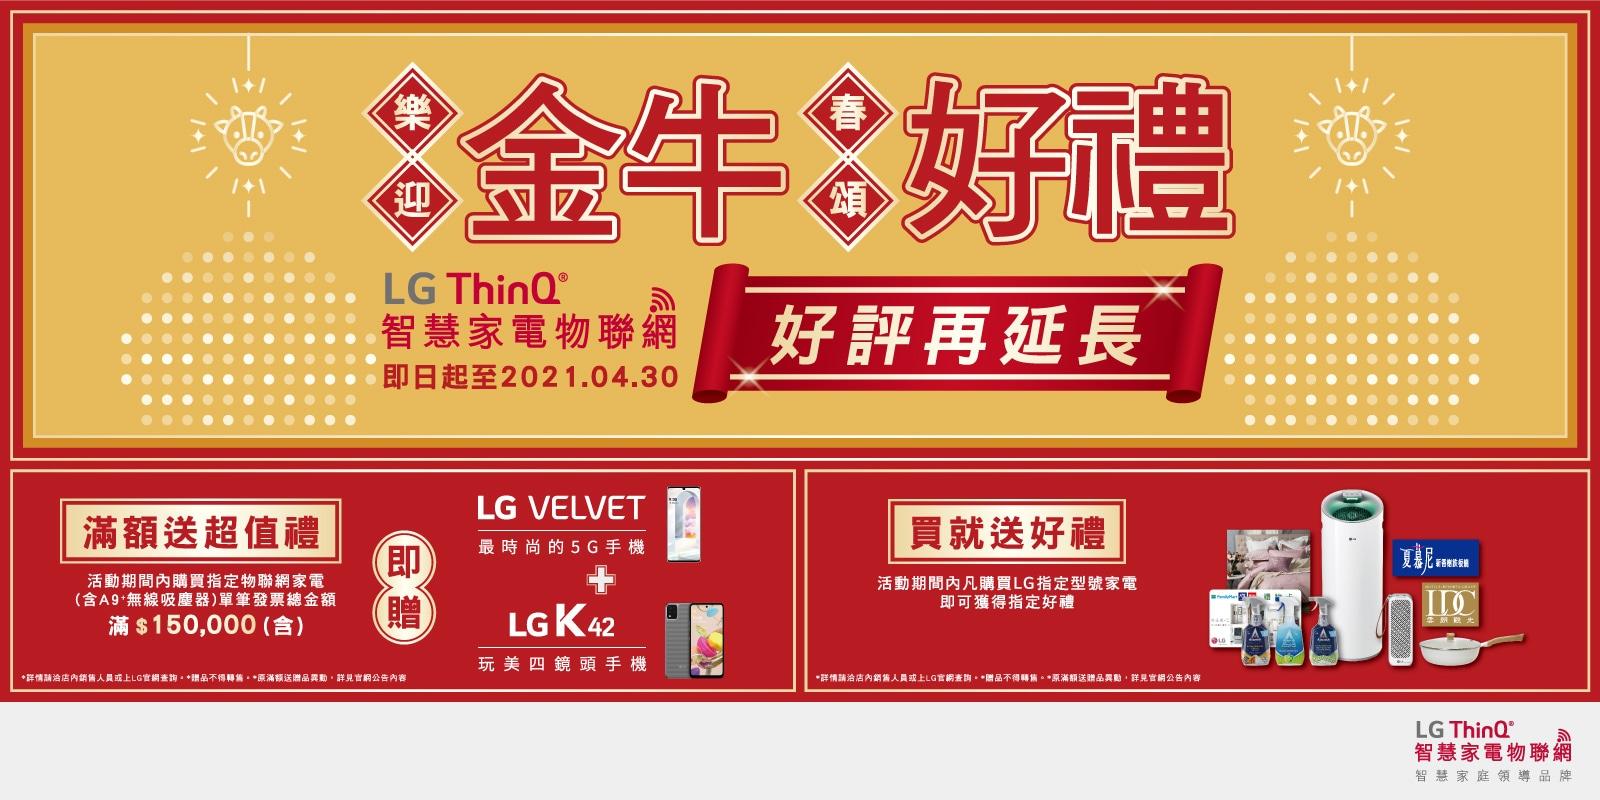 LG-2021-CNY-SP_Hero-Banner_PC_W1600xH800pix_ol